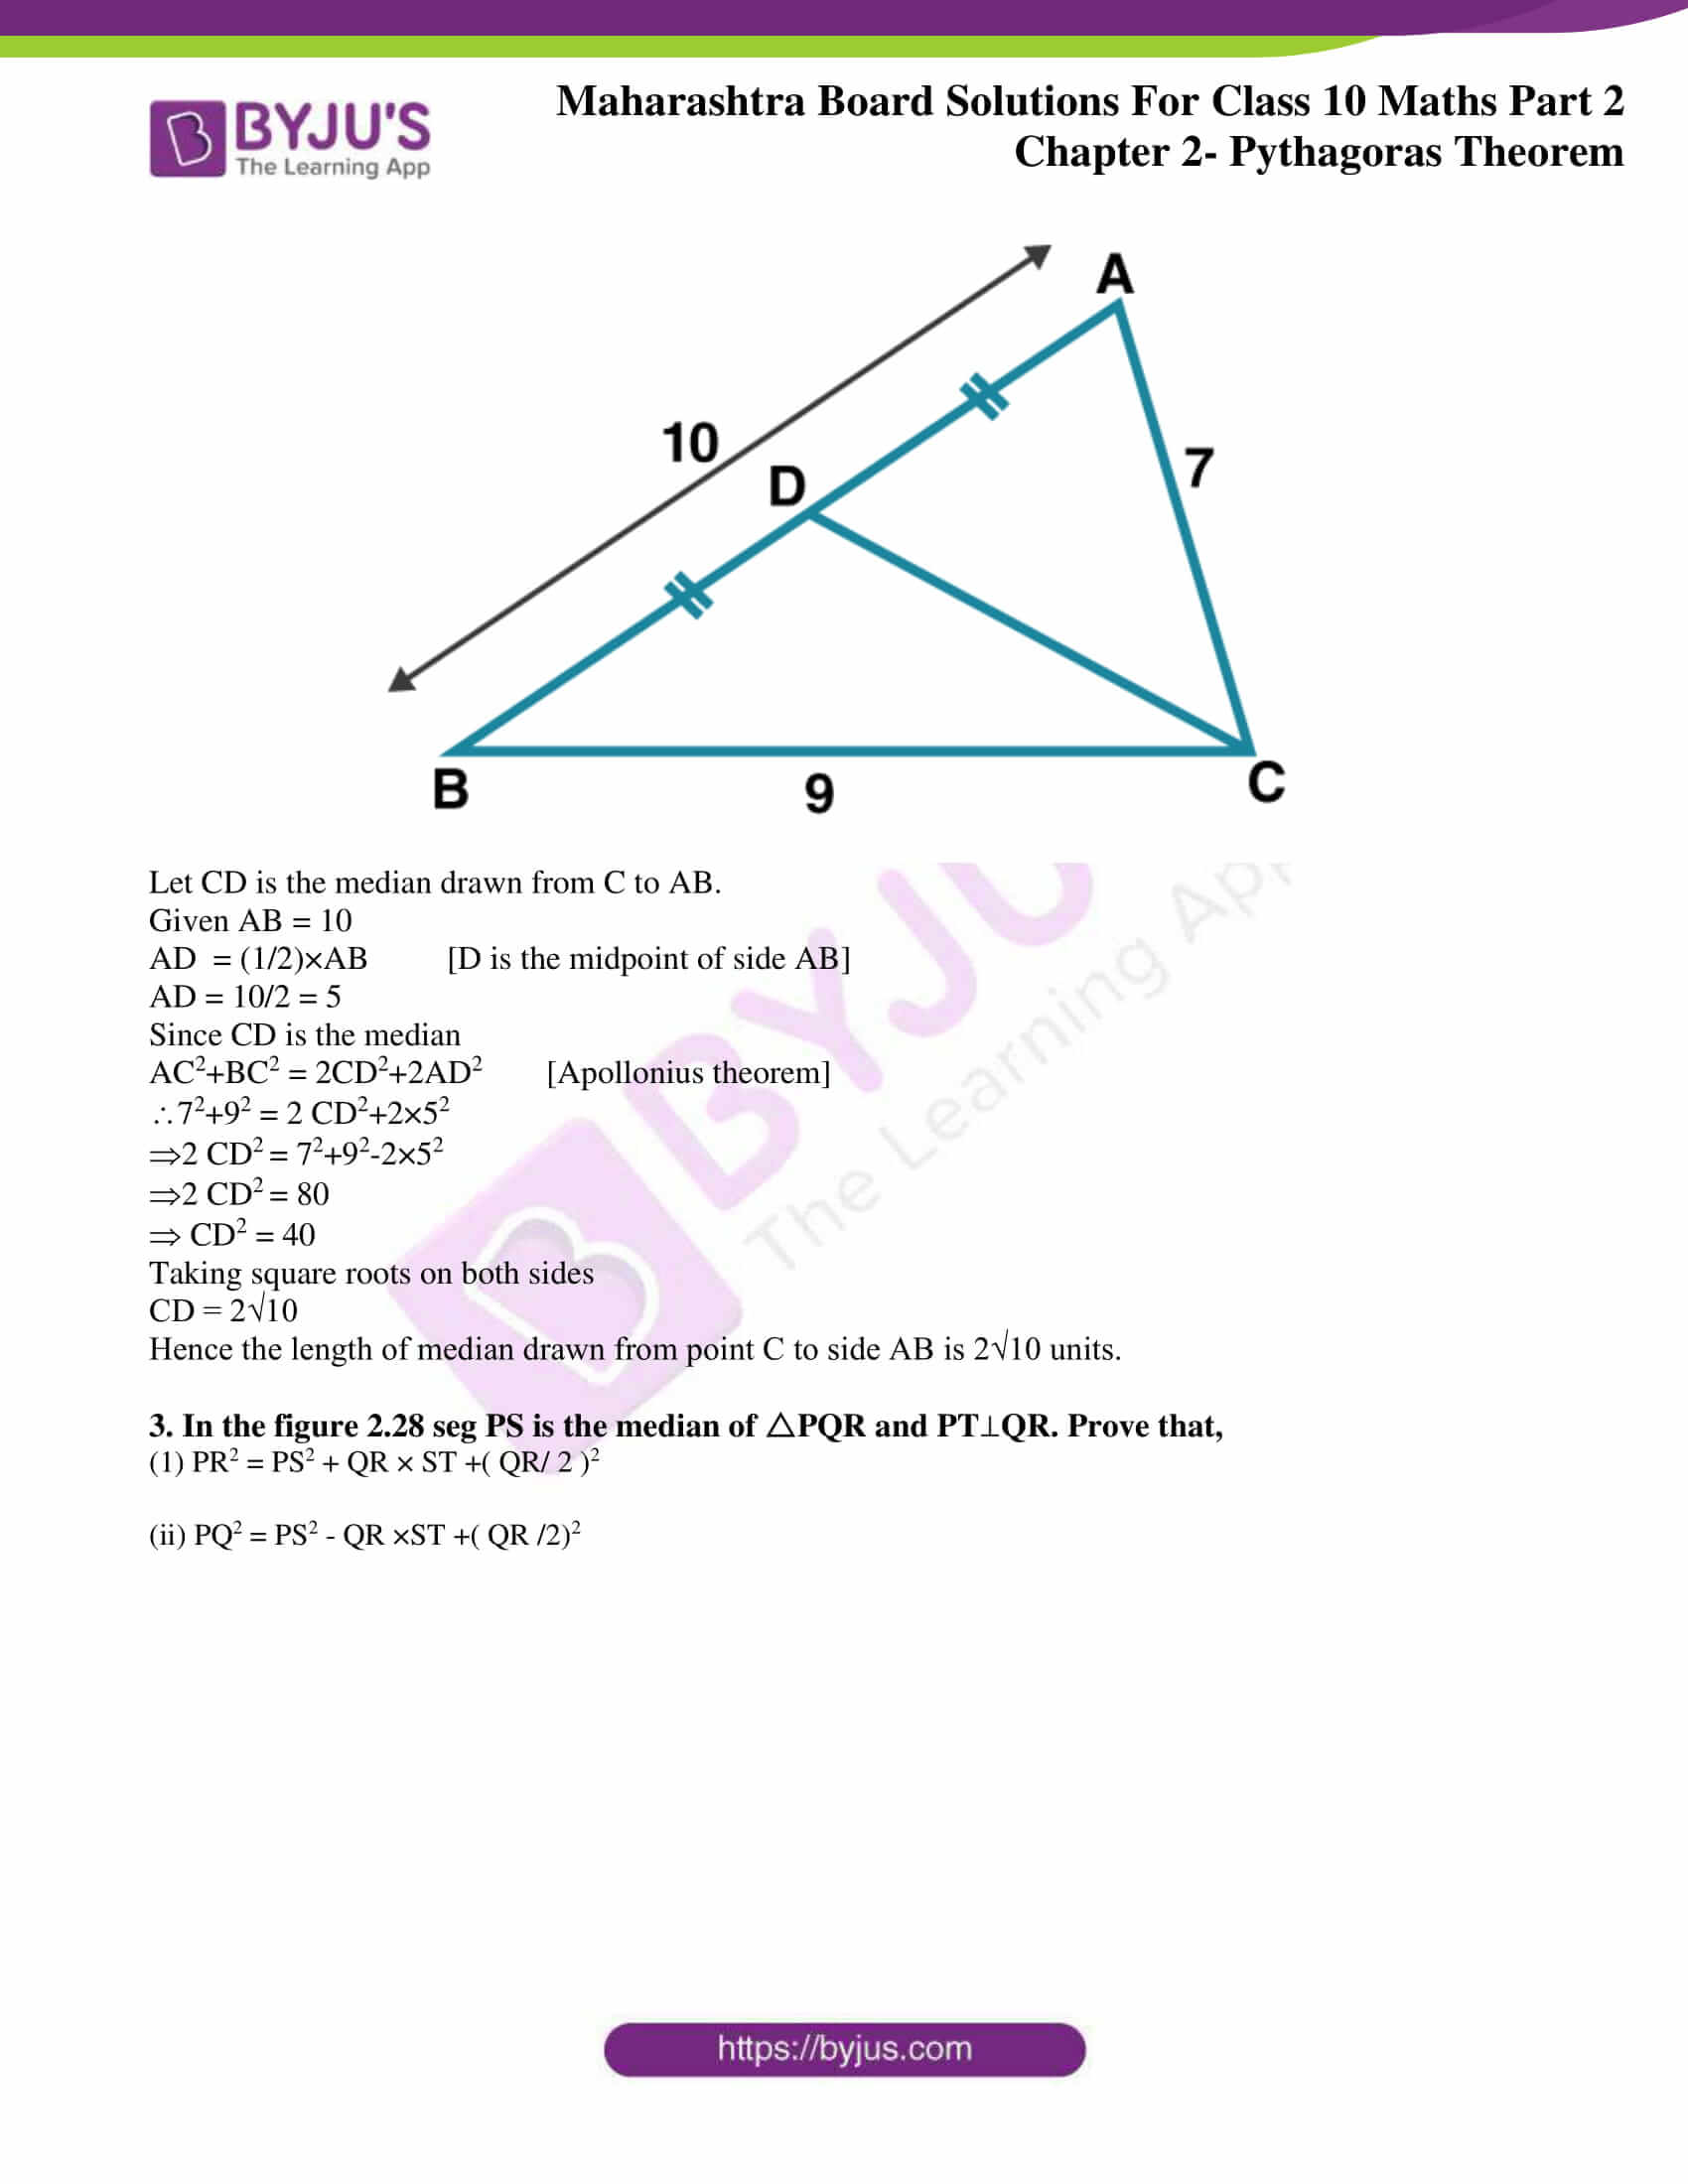 msbshse sol class 10 maths part 2 chapter 2 06